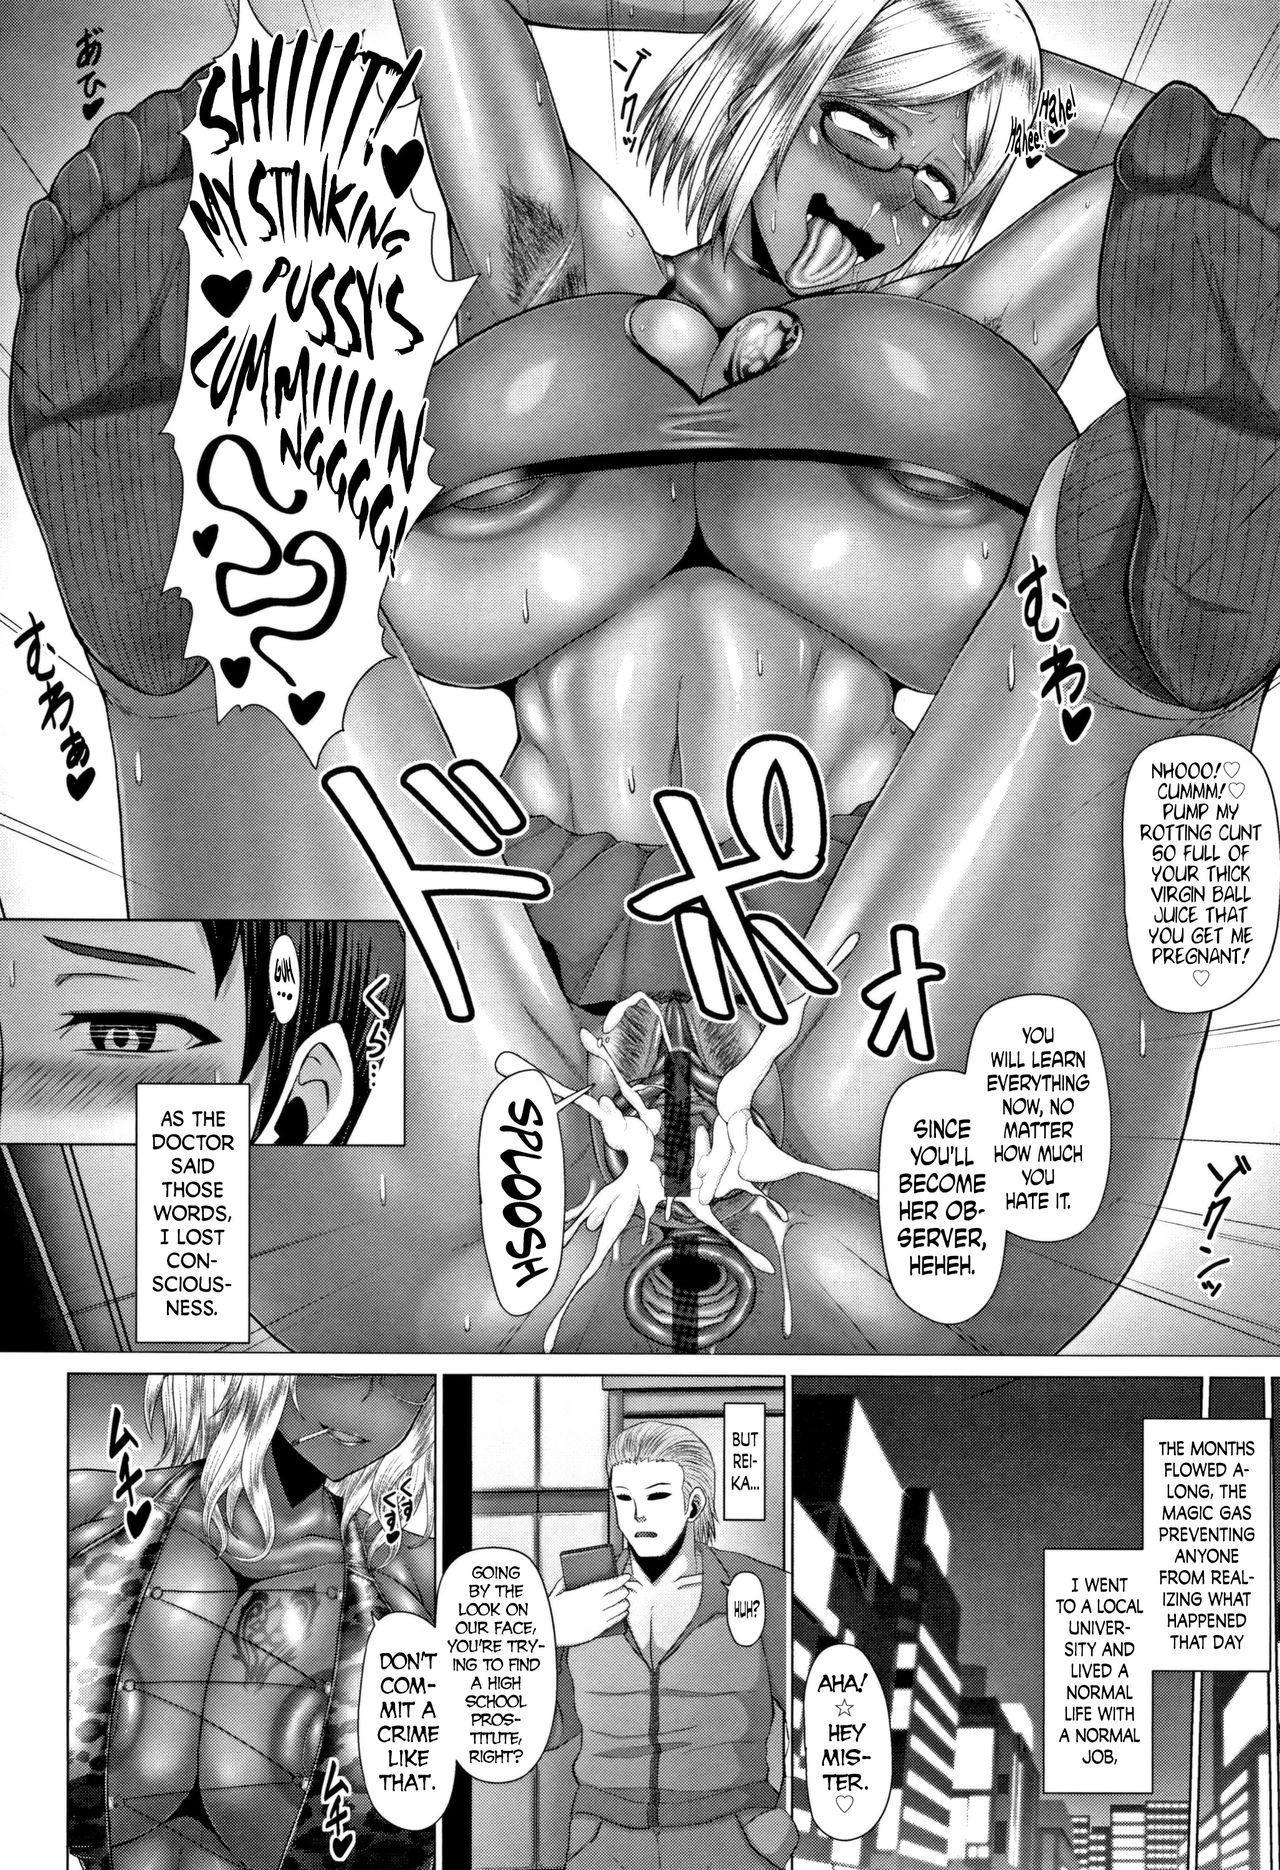 [Inoue Nanaki] Joushiki Daha! Kuro Gal Bitch-ka Seikatsu Ch. 1-3, 5-8 [English] [Dark Mac + N04h] 139